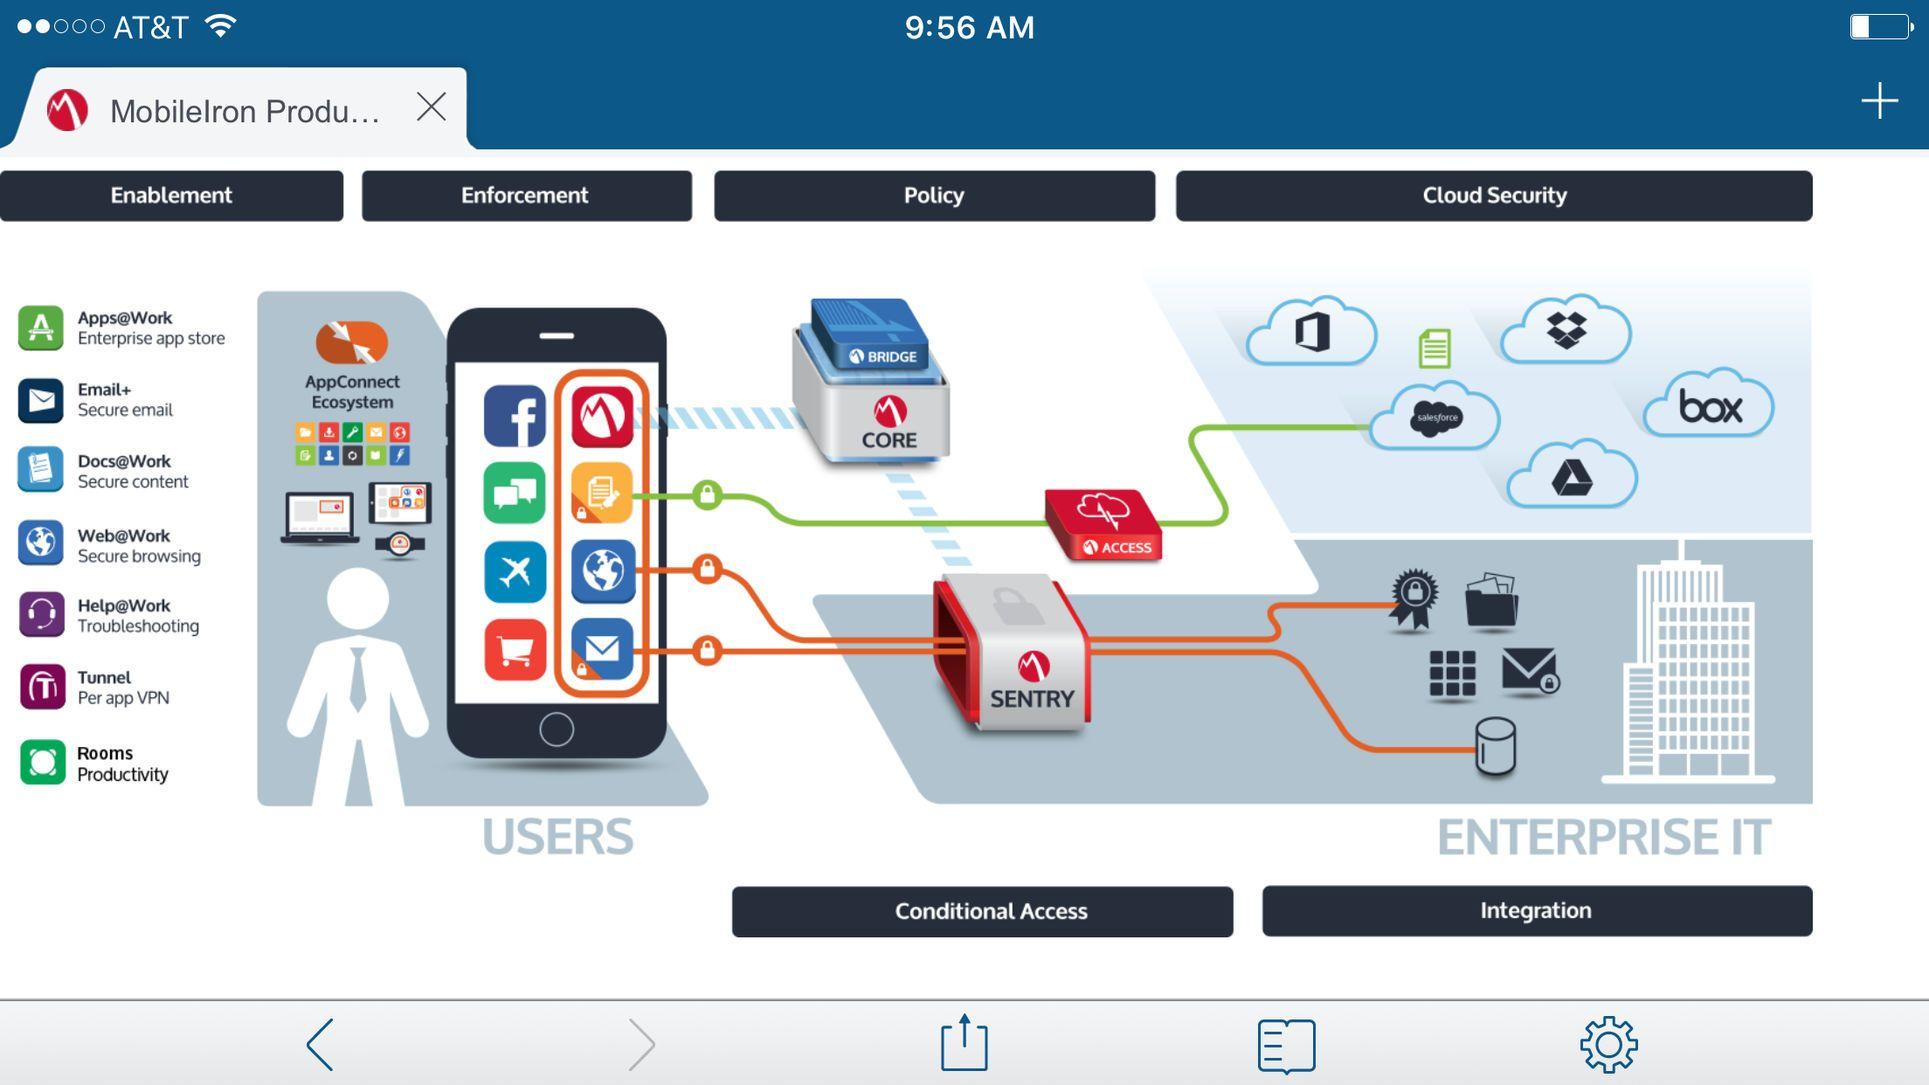 Mobileiron webwork iosutilitiesappapps iphone games